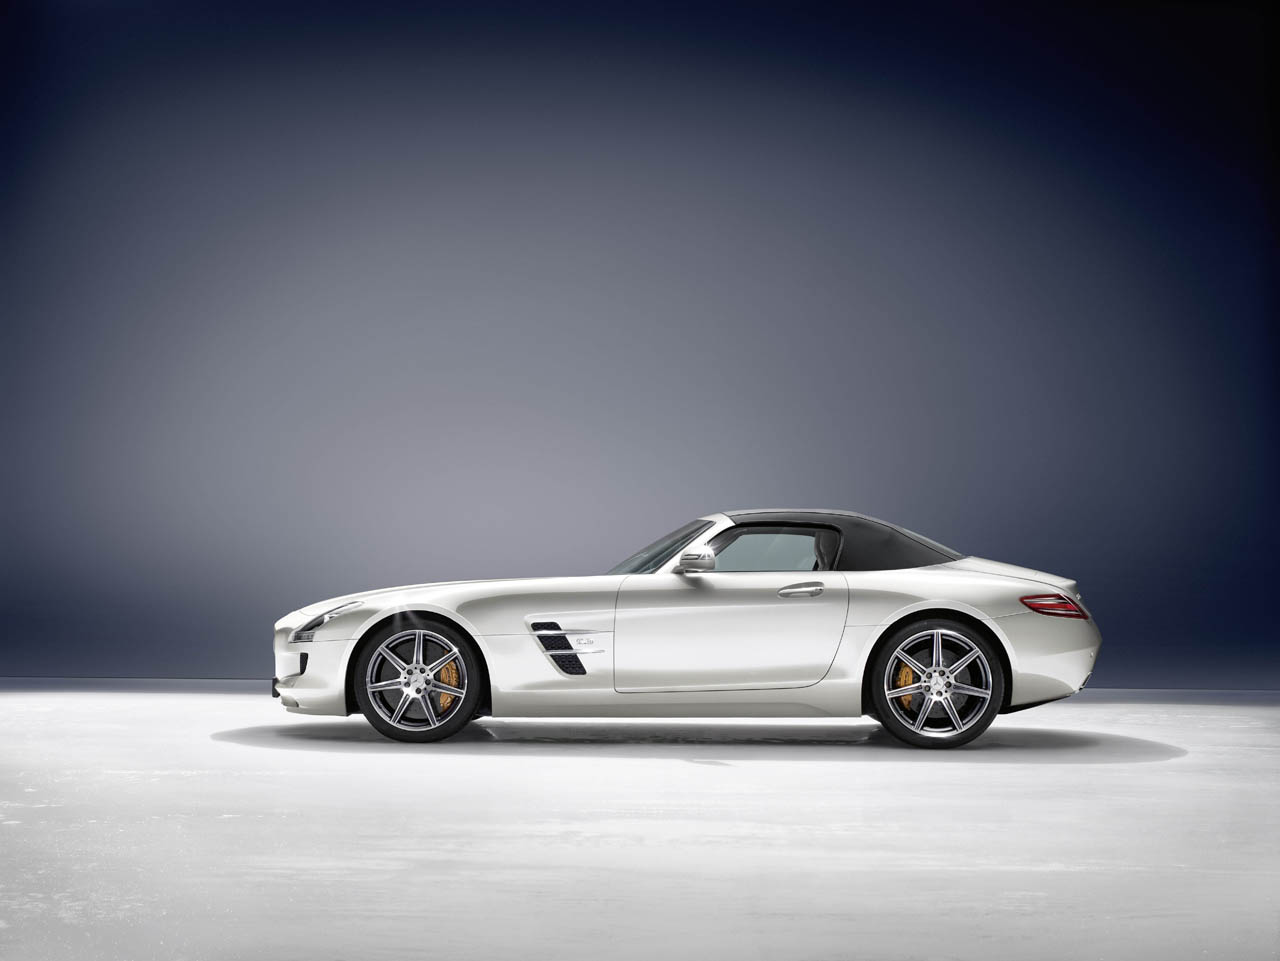 Mercedes Benz Releases 2012 SLS AMG Roadster